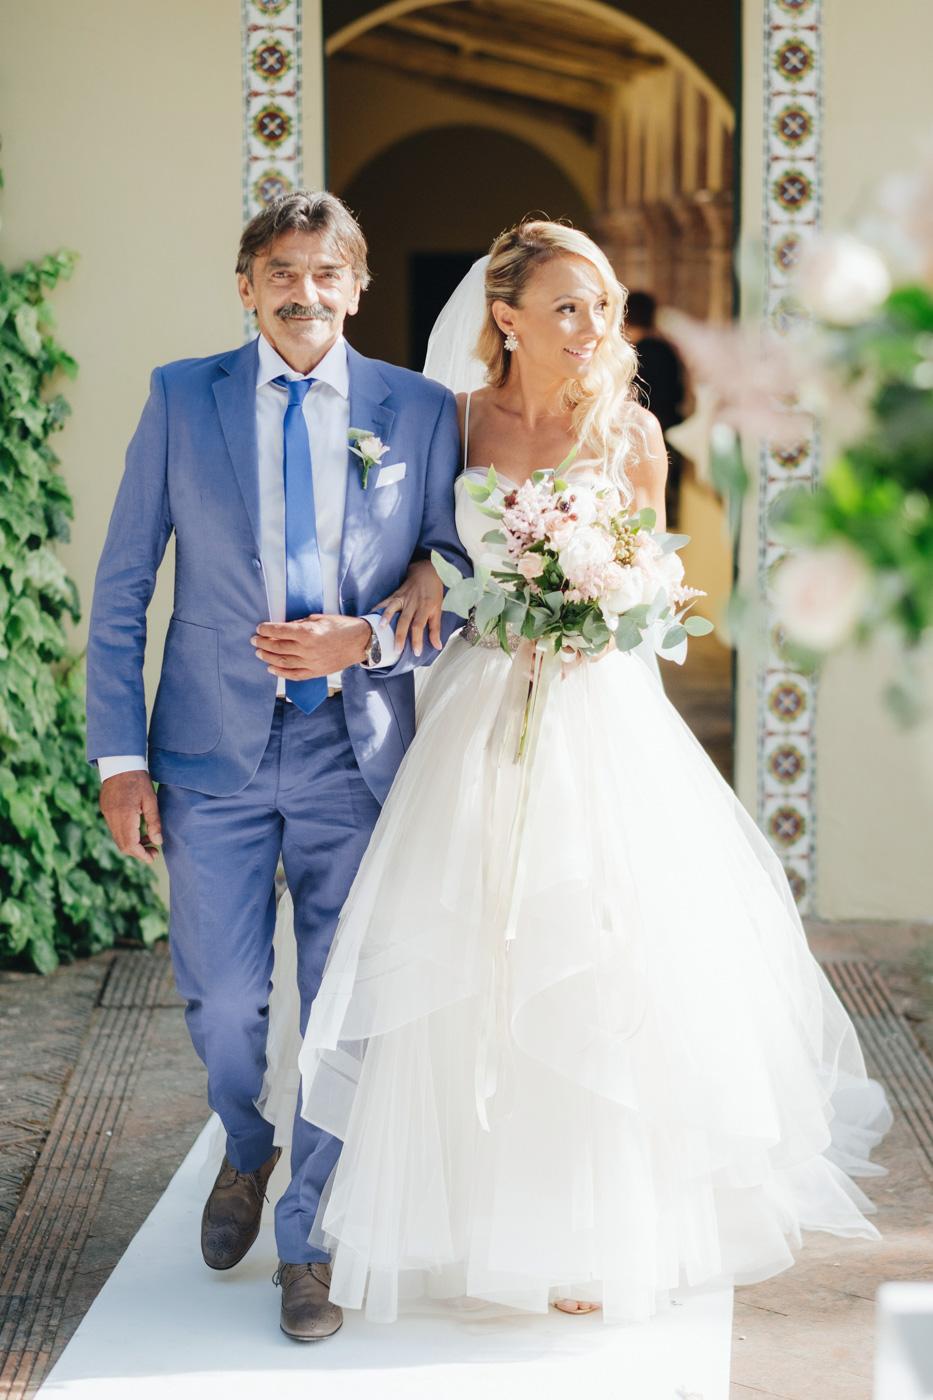 Matrimoni all'italiana wedding photographer italy-61.jpg